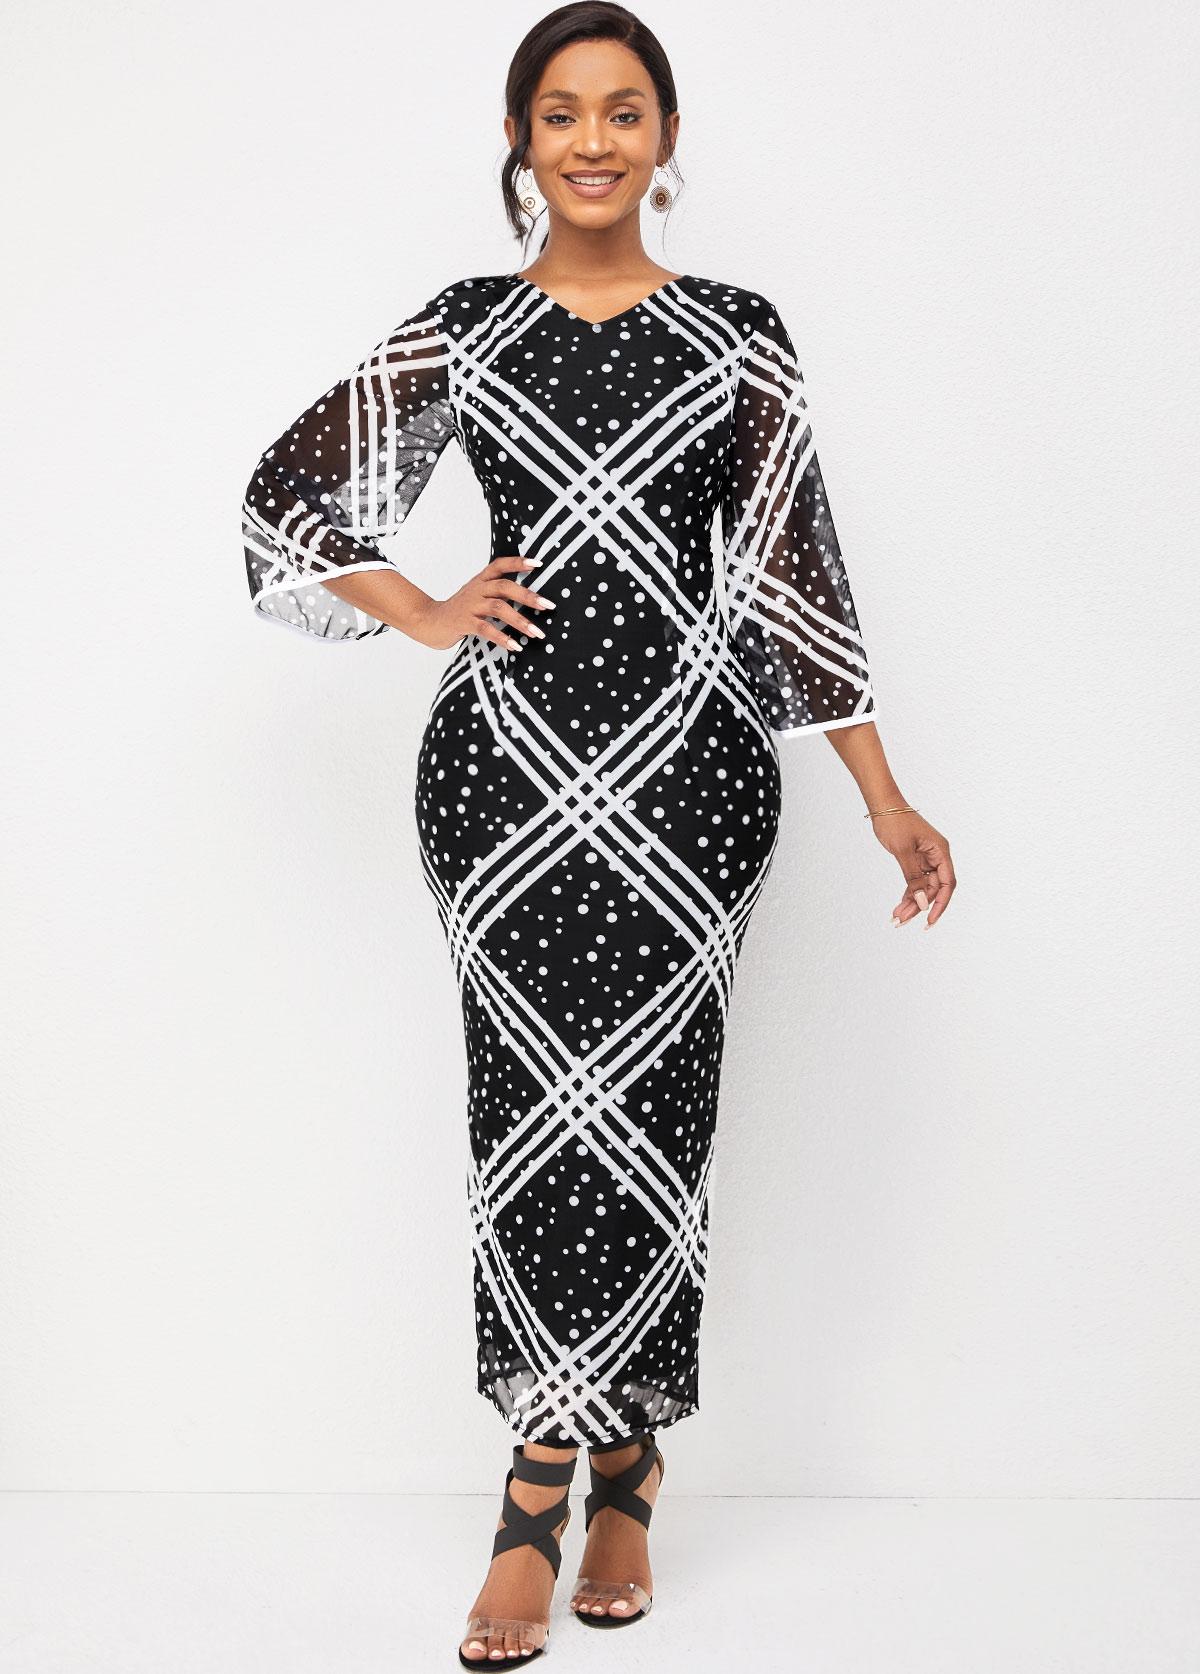 Flare Sleeve V Neck Striped and Polka Dot Dress